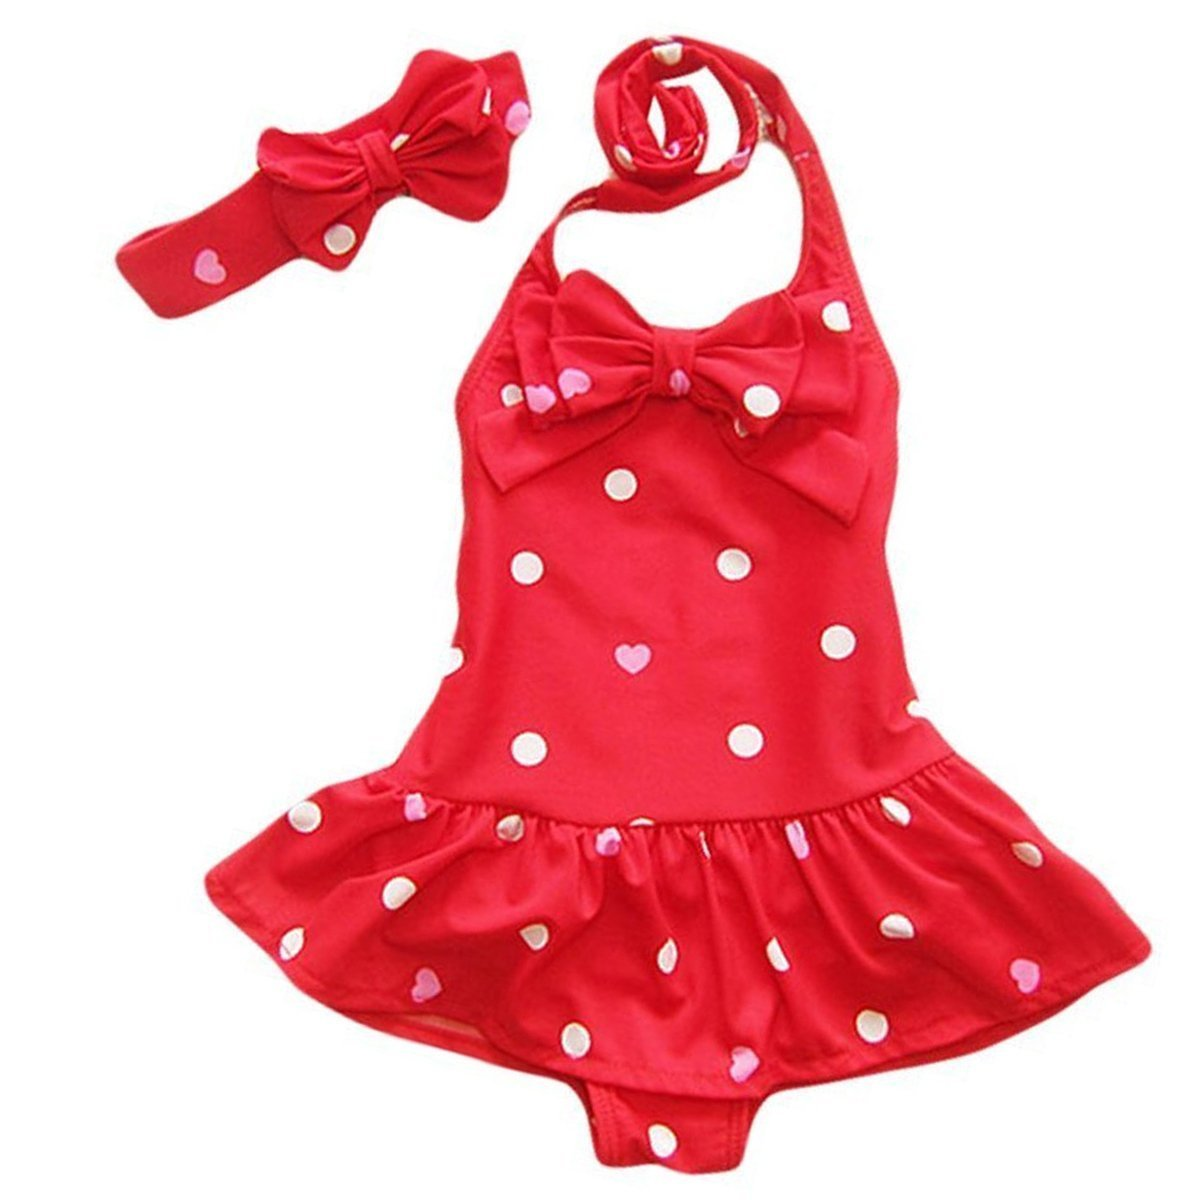 Lever Baby Badeanzug Mädchen Tankini Bikini Einteiler Badeanzug Polka Dots Schwimmanzug Bademode Mit Haarband